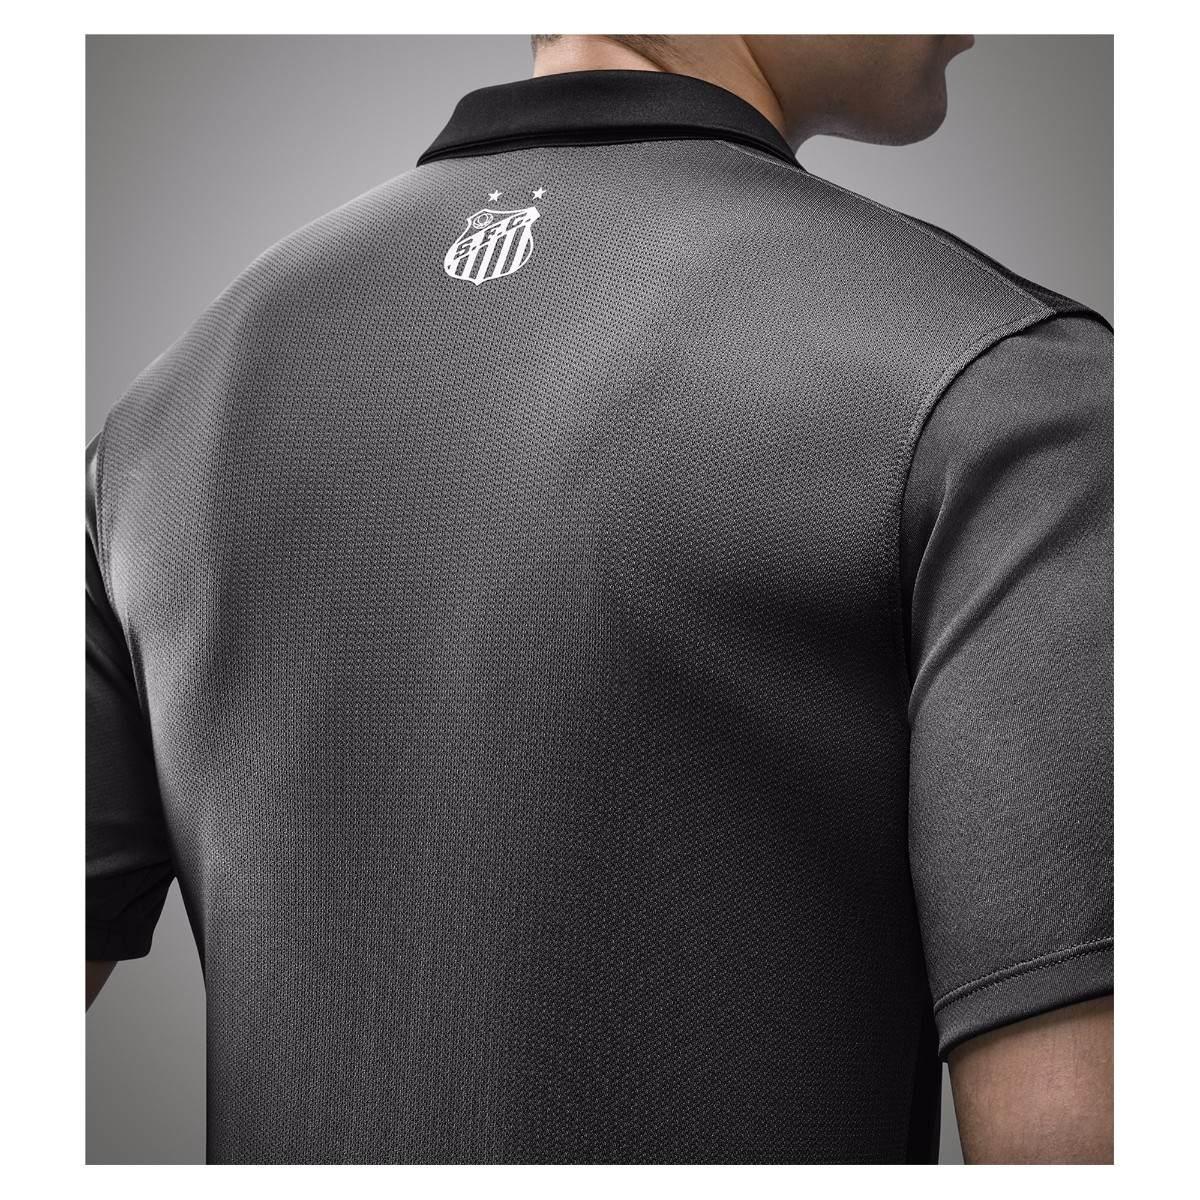 7da76c7412607 Camisa Santos Fc 2015 Cinza - Nike - Original! - R  179